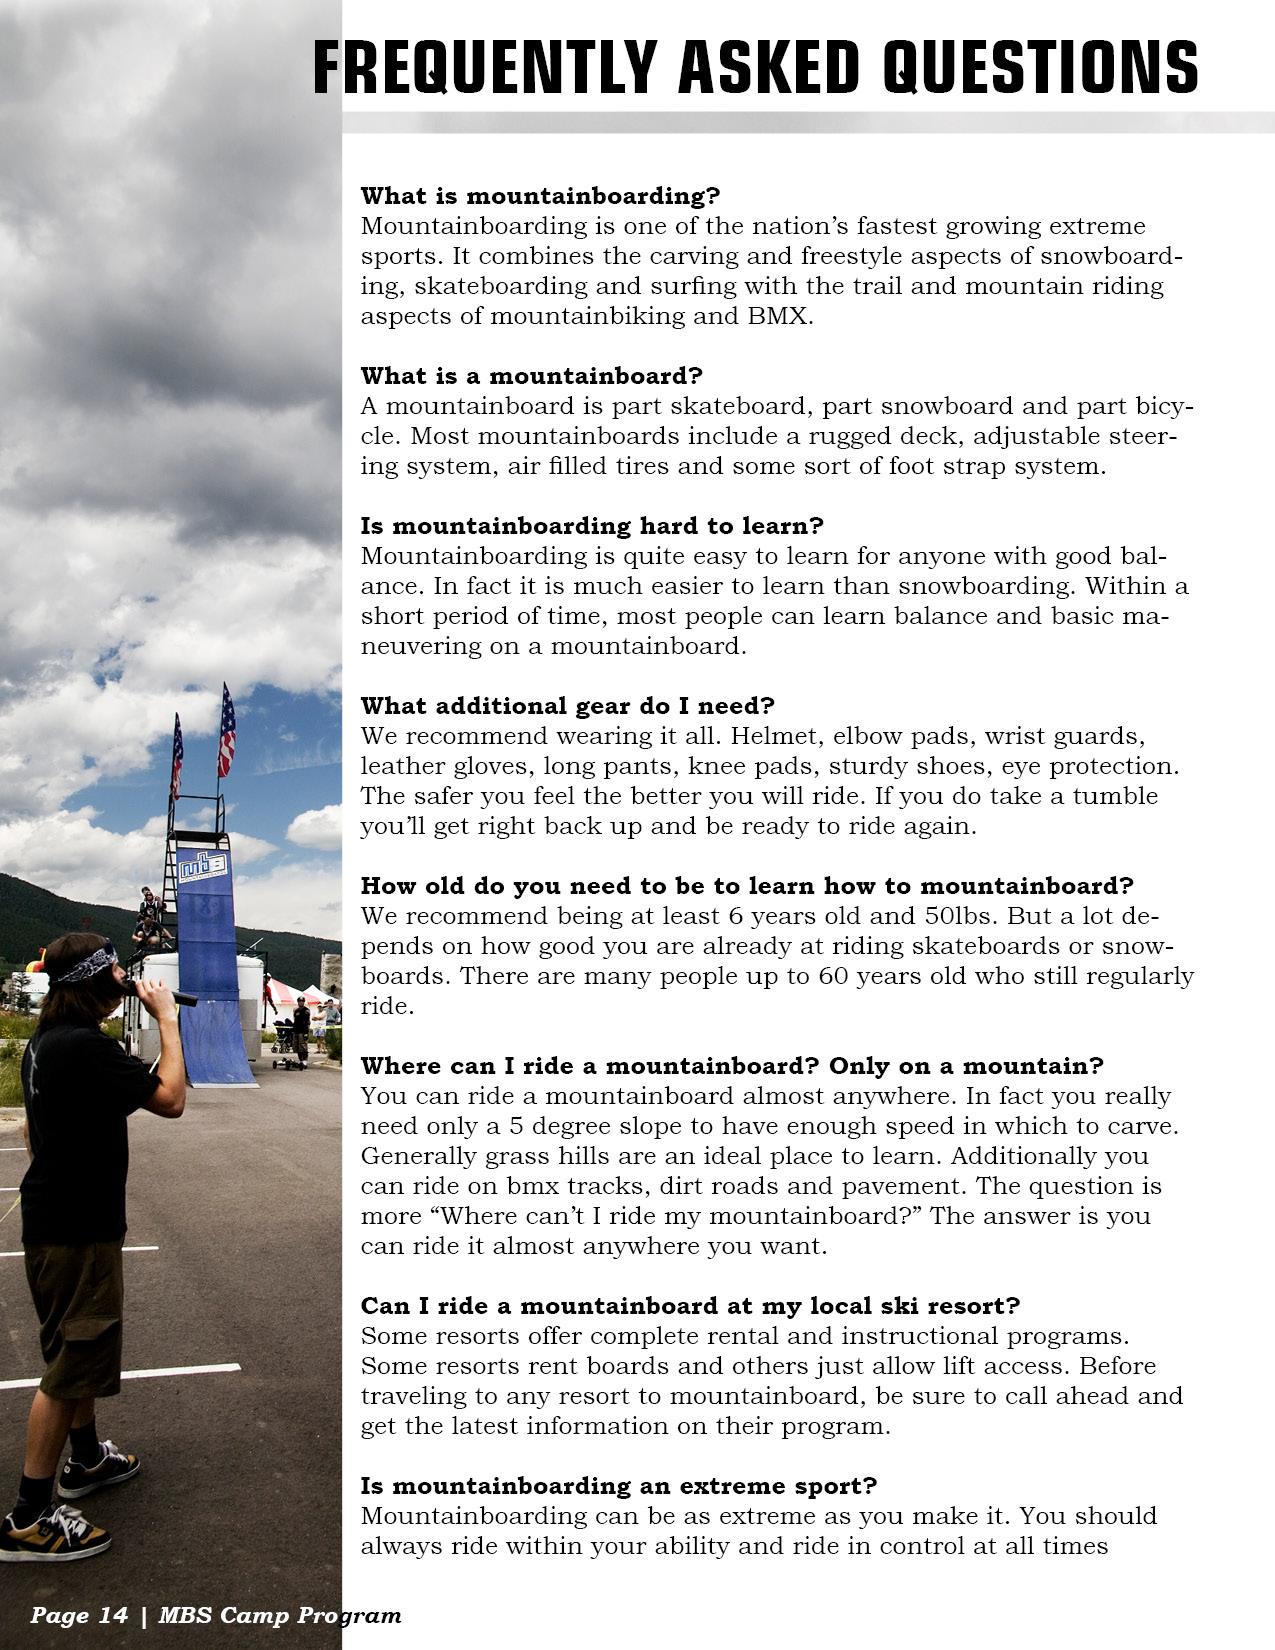 MBS Camp Program - Manual - Final Draft14.jpg